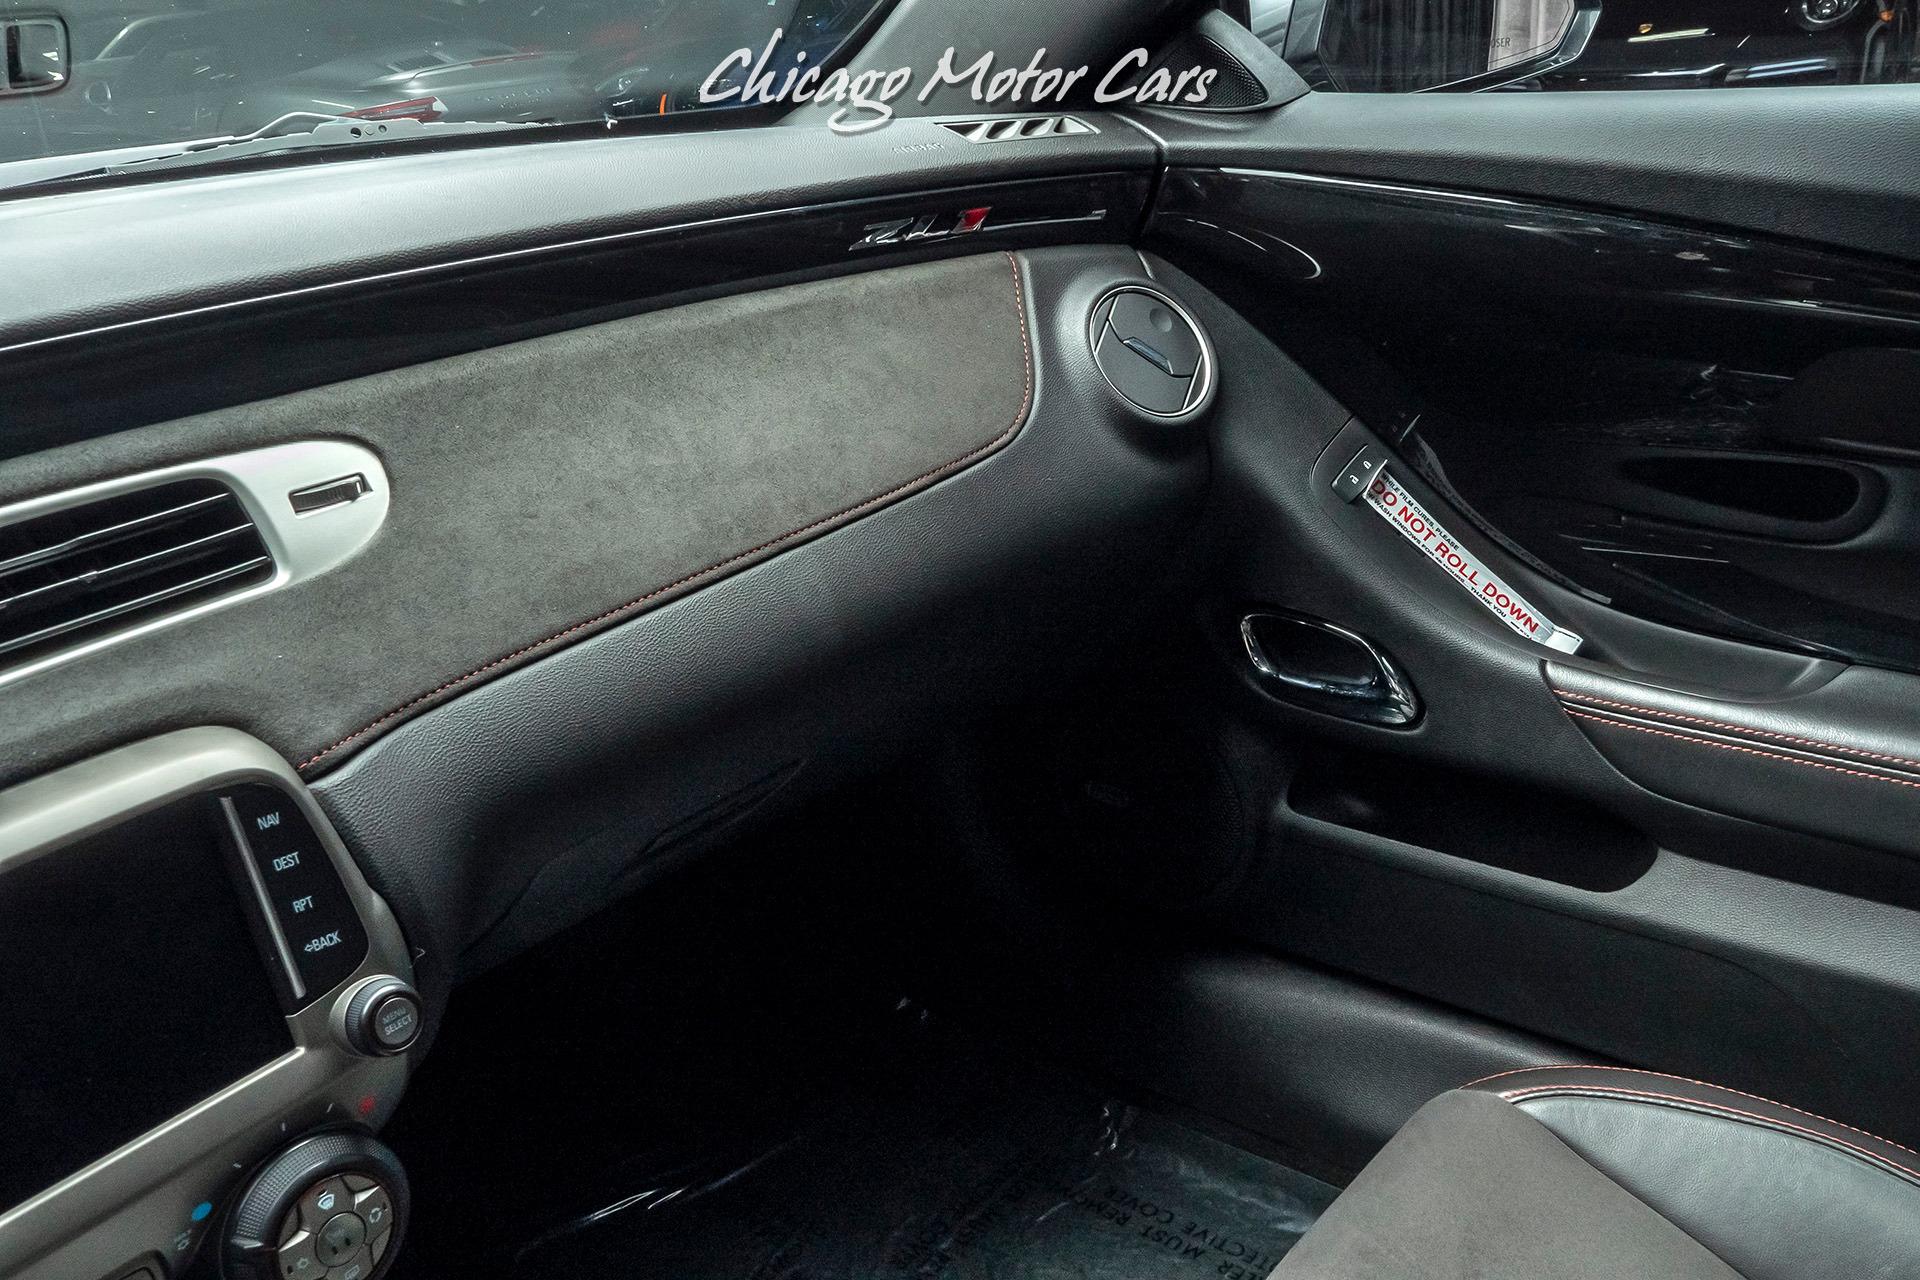 Used-2013-Chevrolet-Camaro-ZL1-MSRP-61200UPGRADES